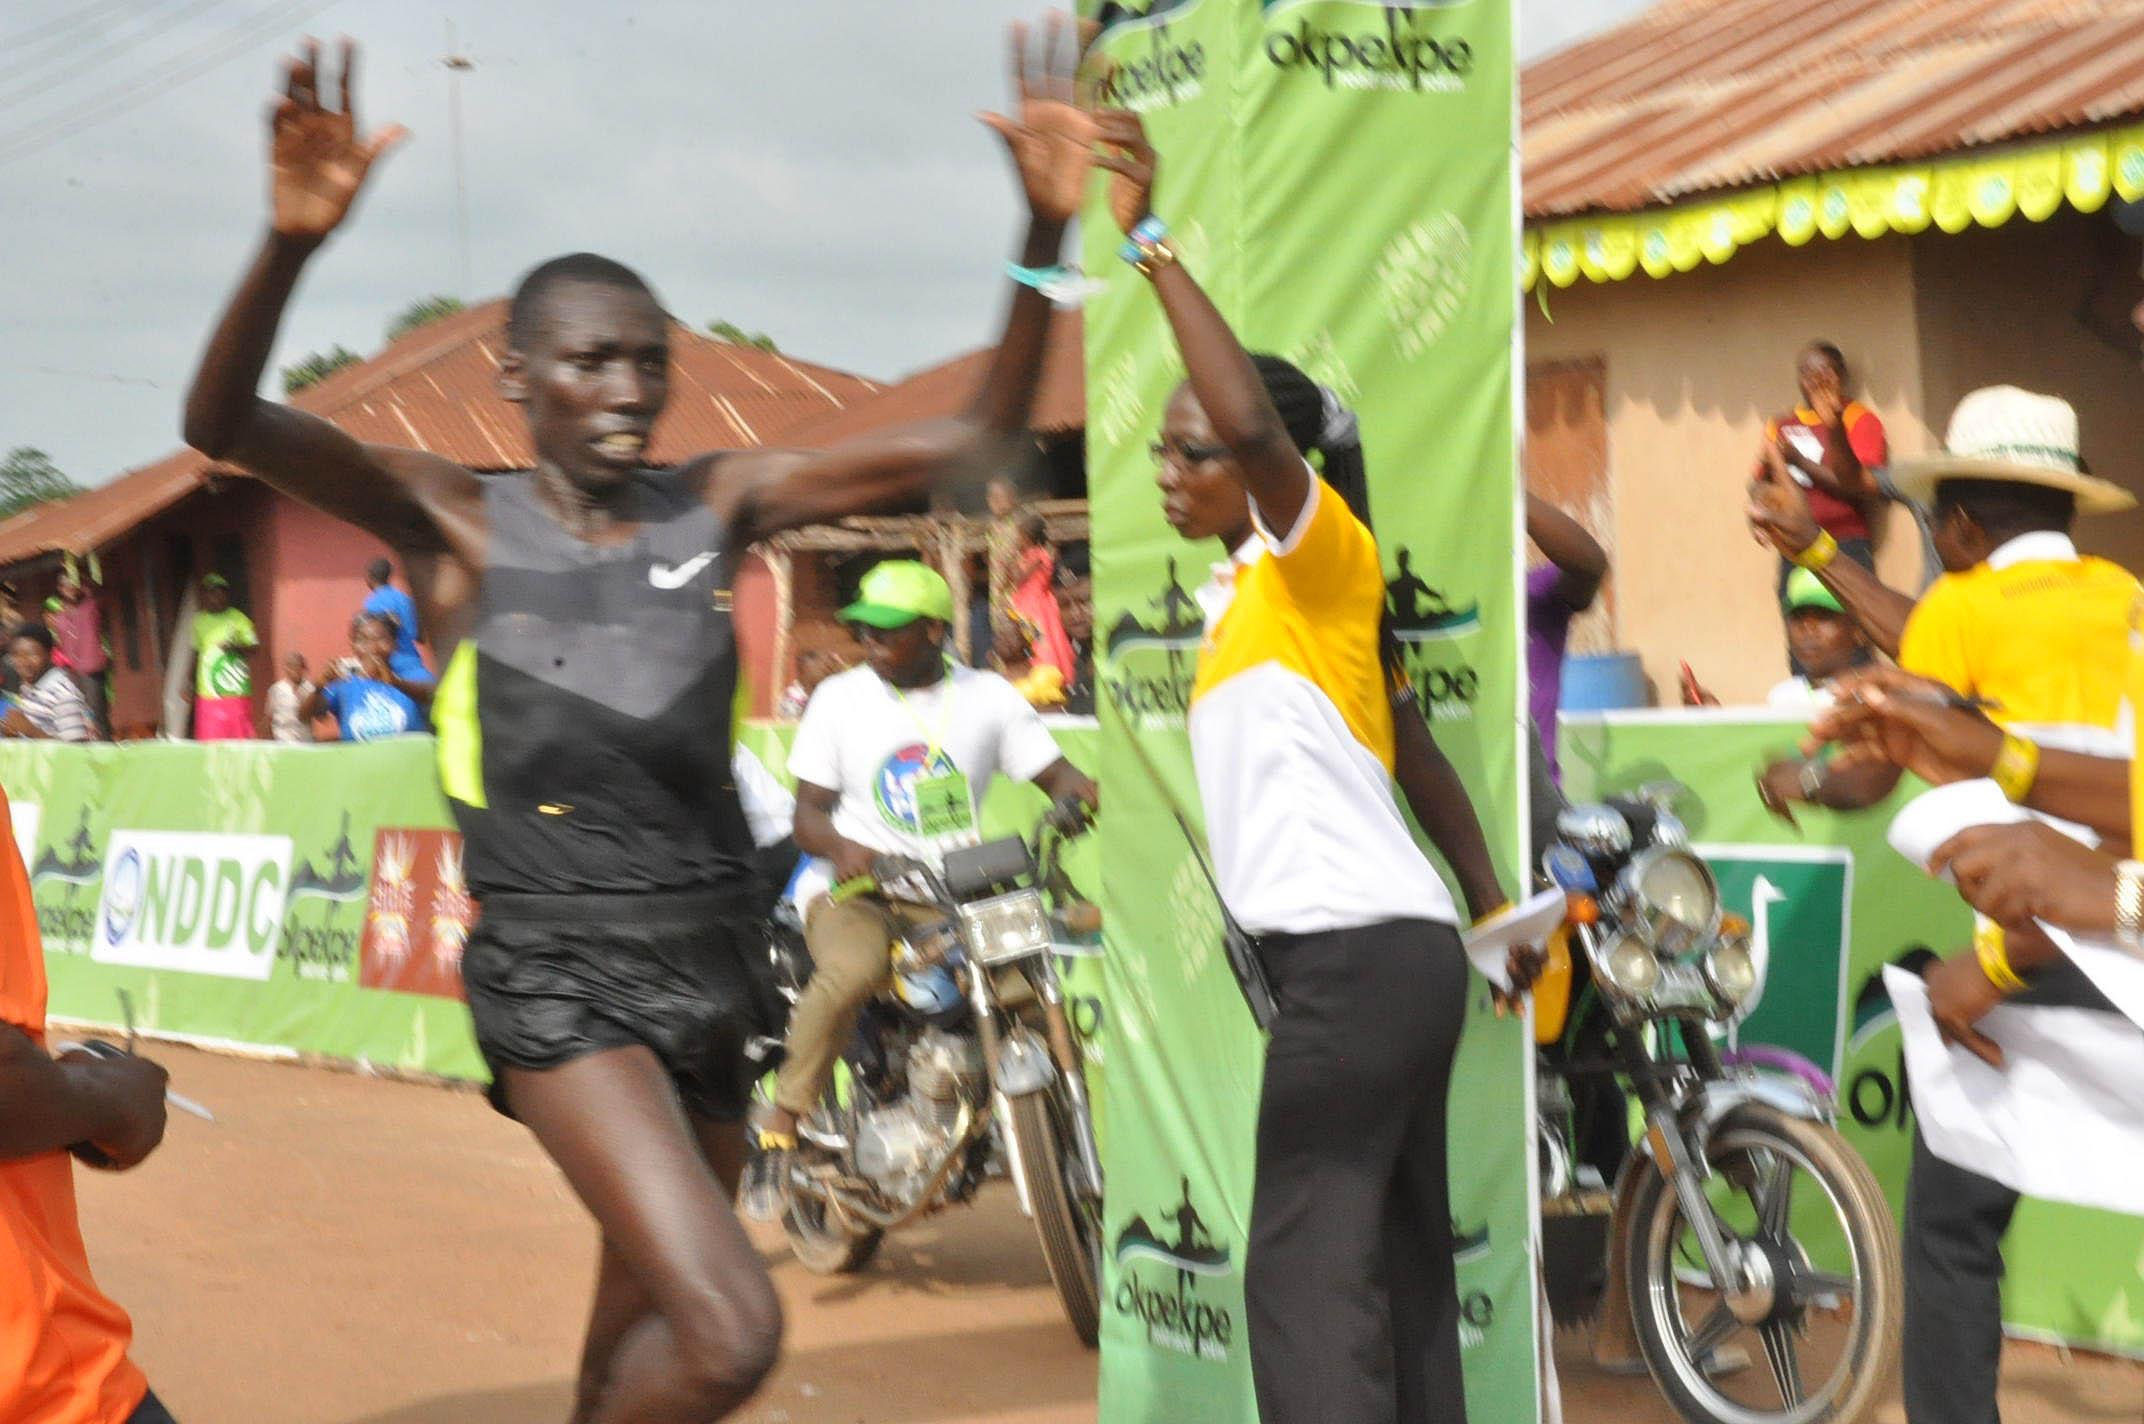 PIC. 7. MOSES MASSAI FROM KENYA WINNING THE OKPEKPE   INTERNATIONAL 10KM ROAD RACE IN AUCHI , EDO  BY 59.3SEC.